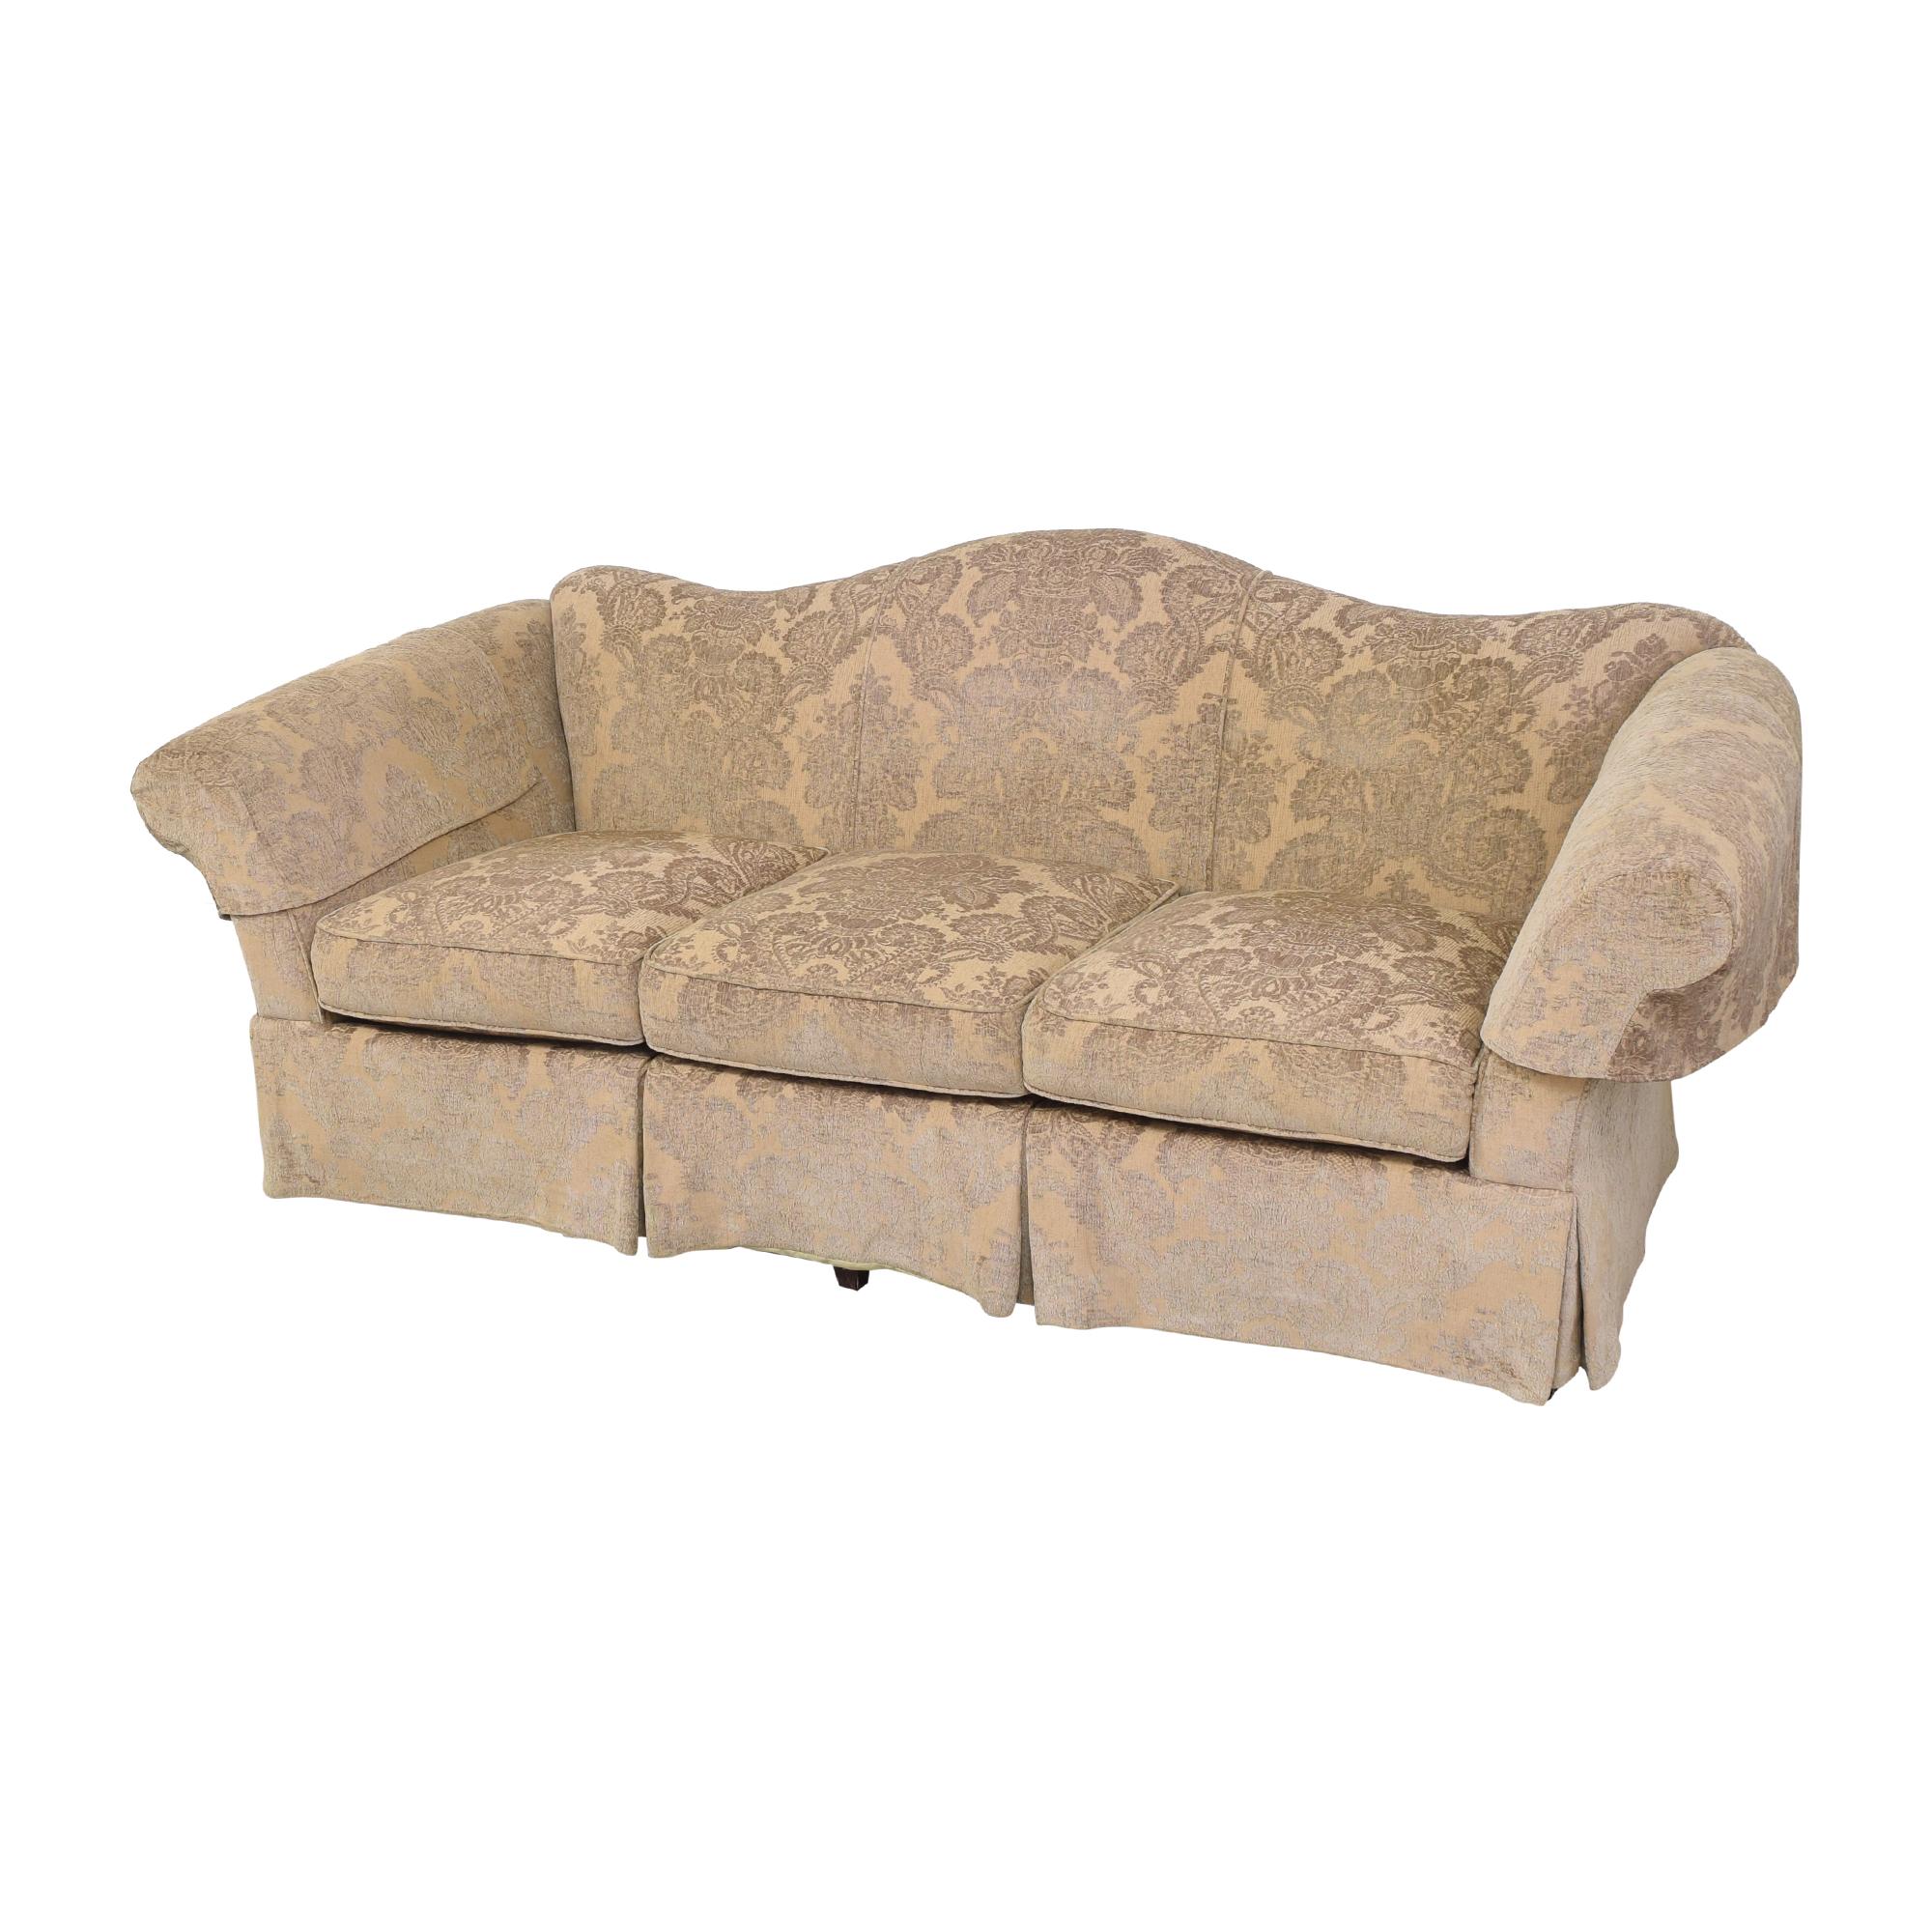 Lee Industries Lee Industries Camelback Three Cushion Sofa second hand